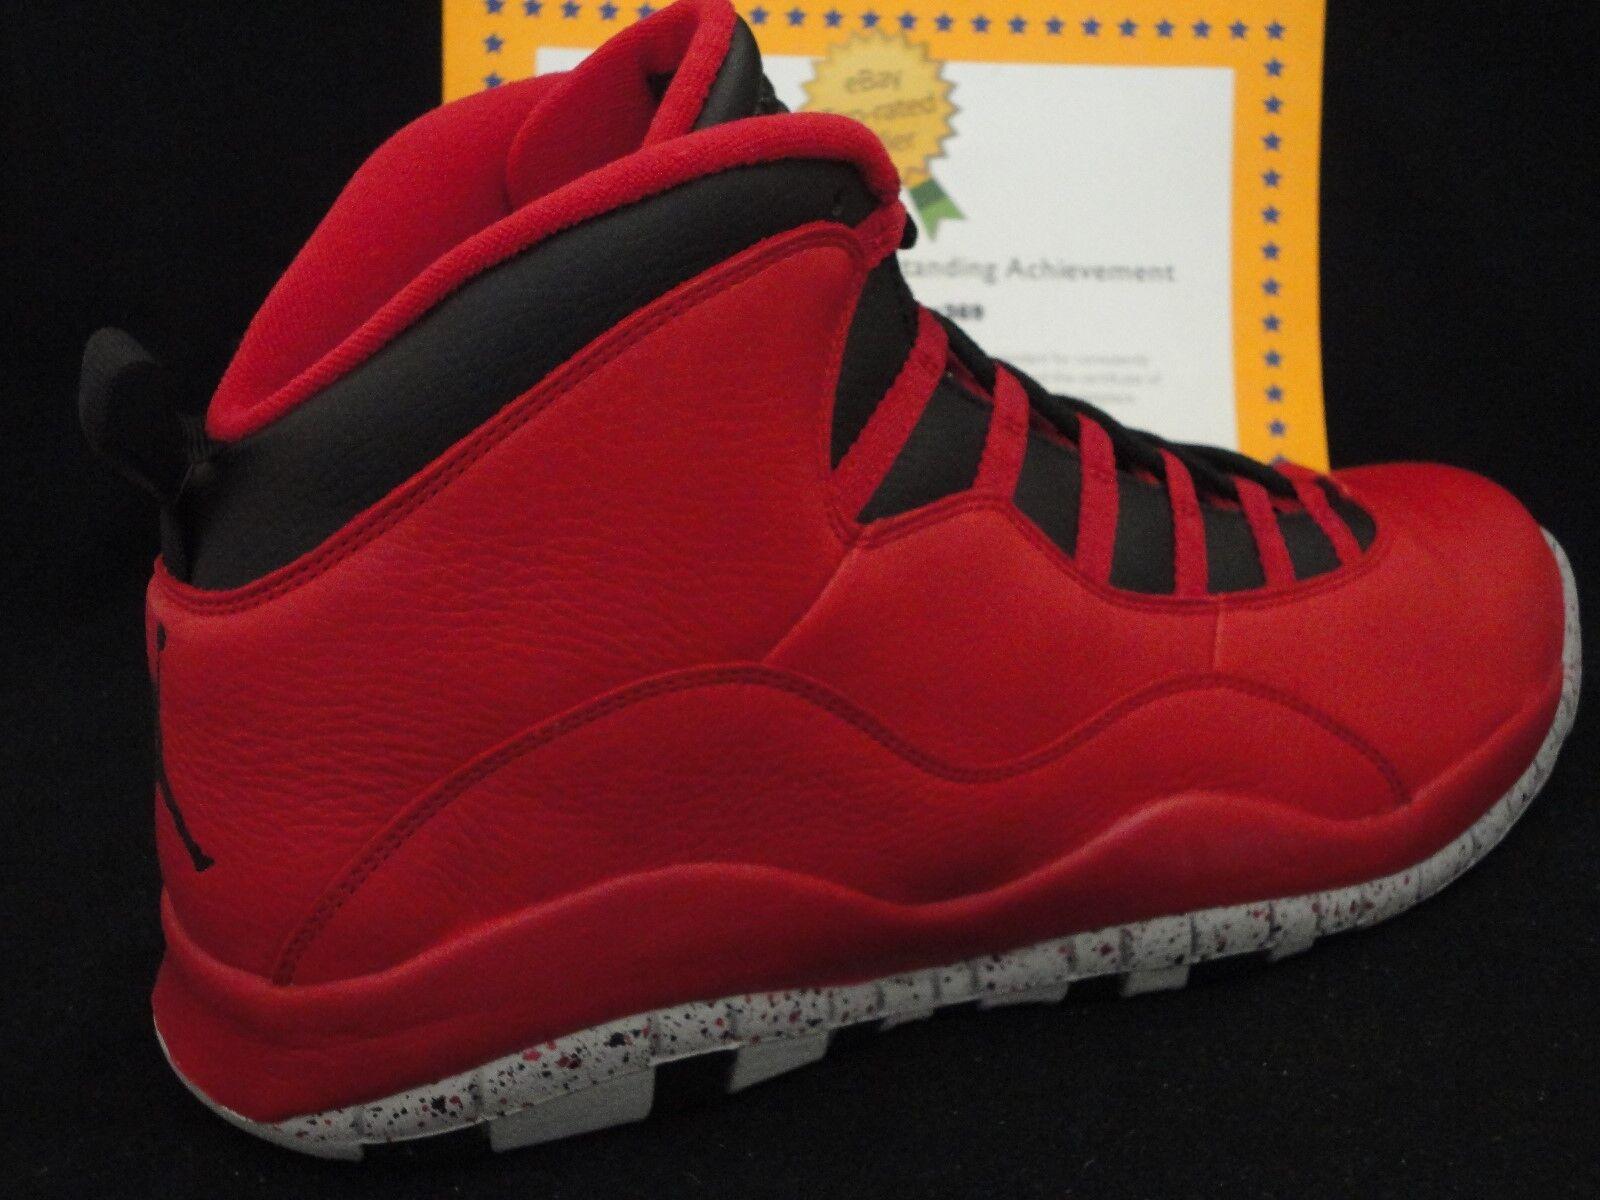 Nike Air Jordan 10 Retro 30th, Bulls Over Broadway, Toro, Size 17